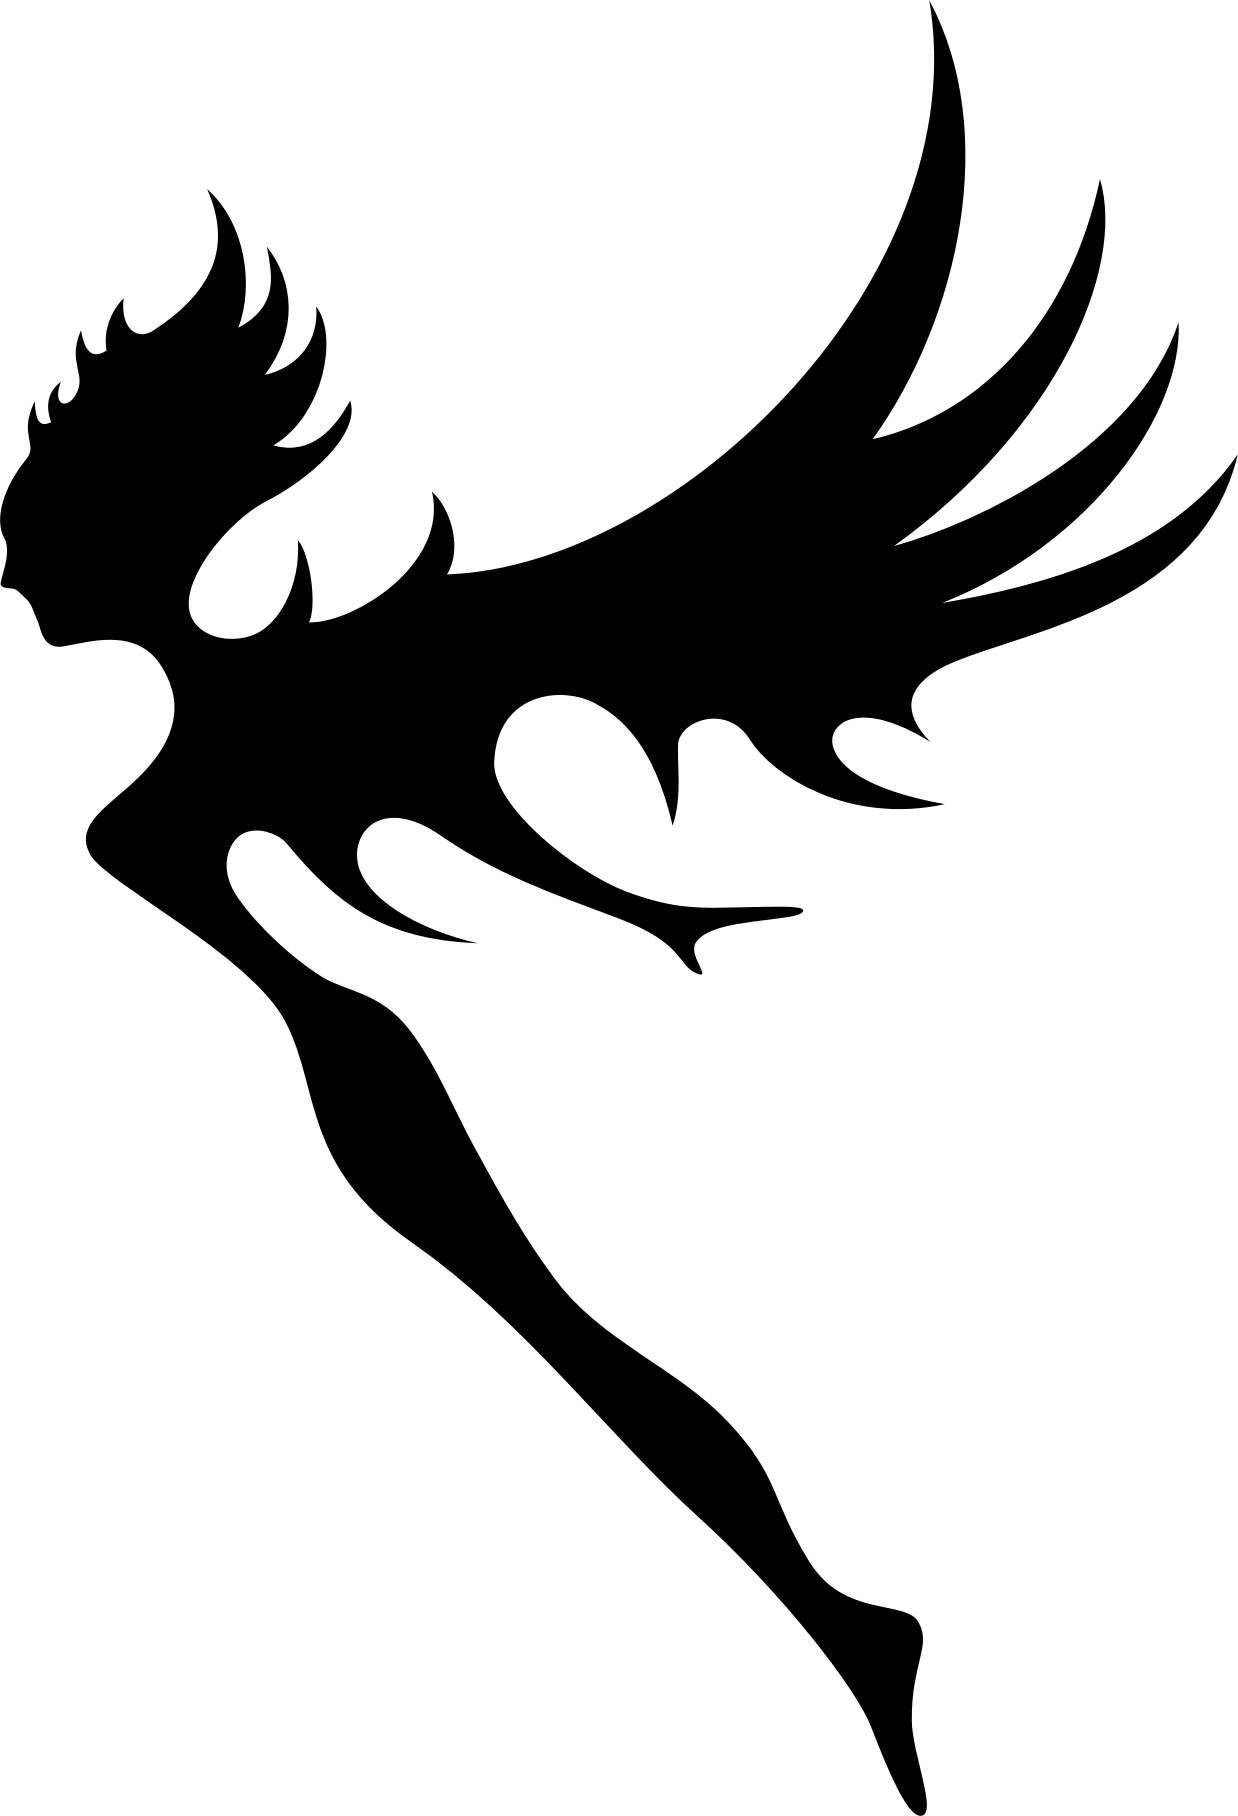 1238x1816 Clipart